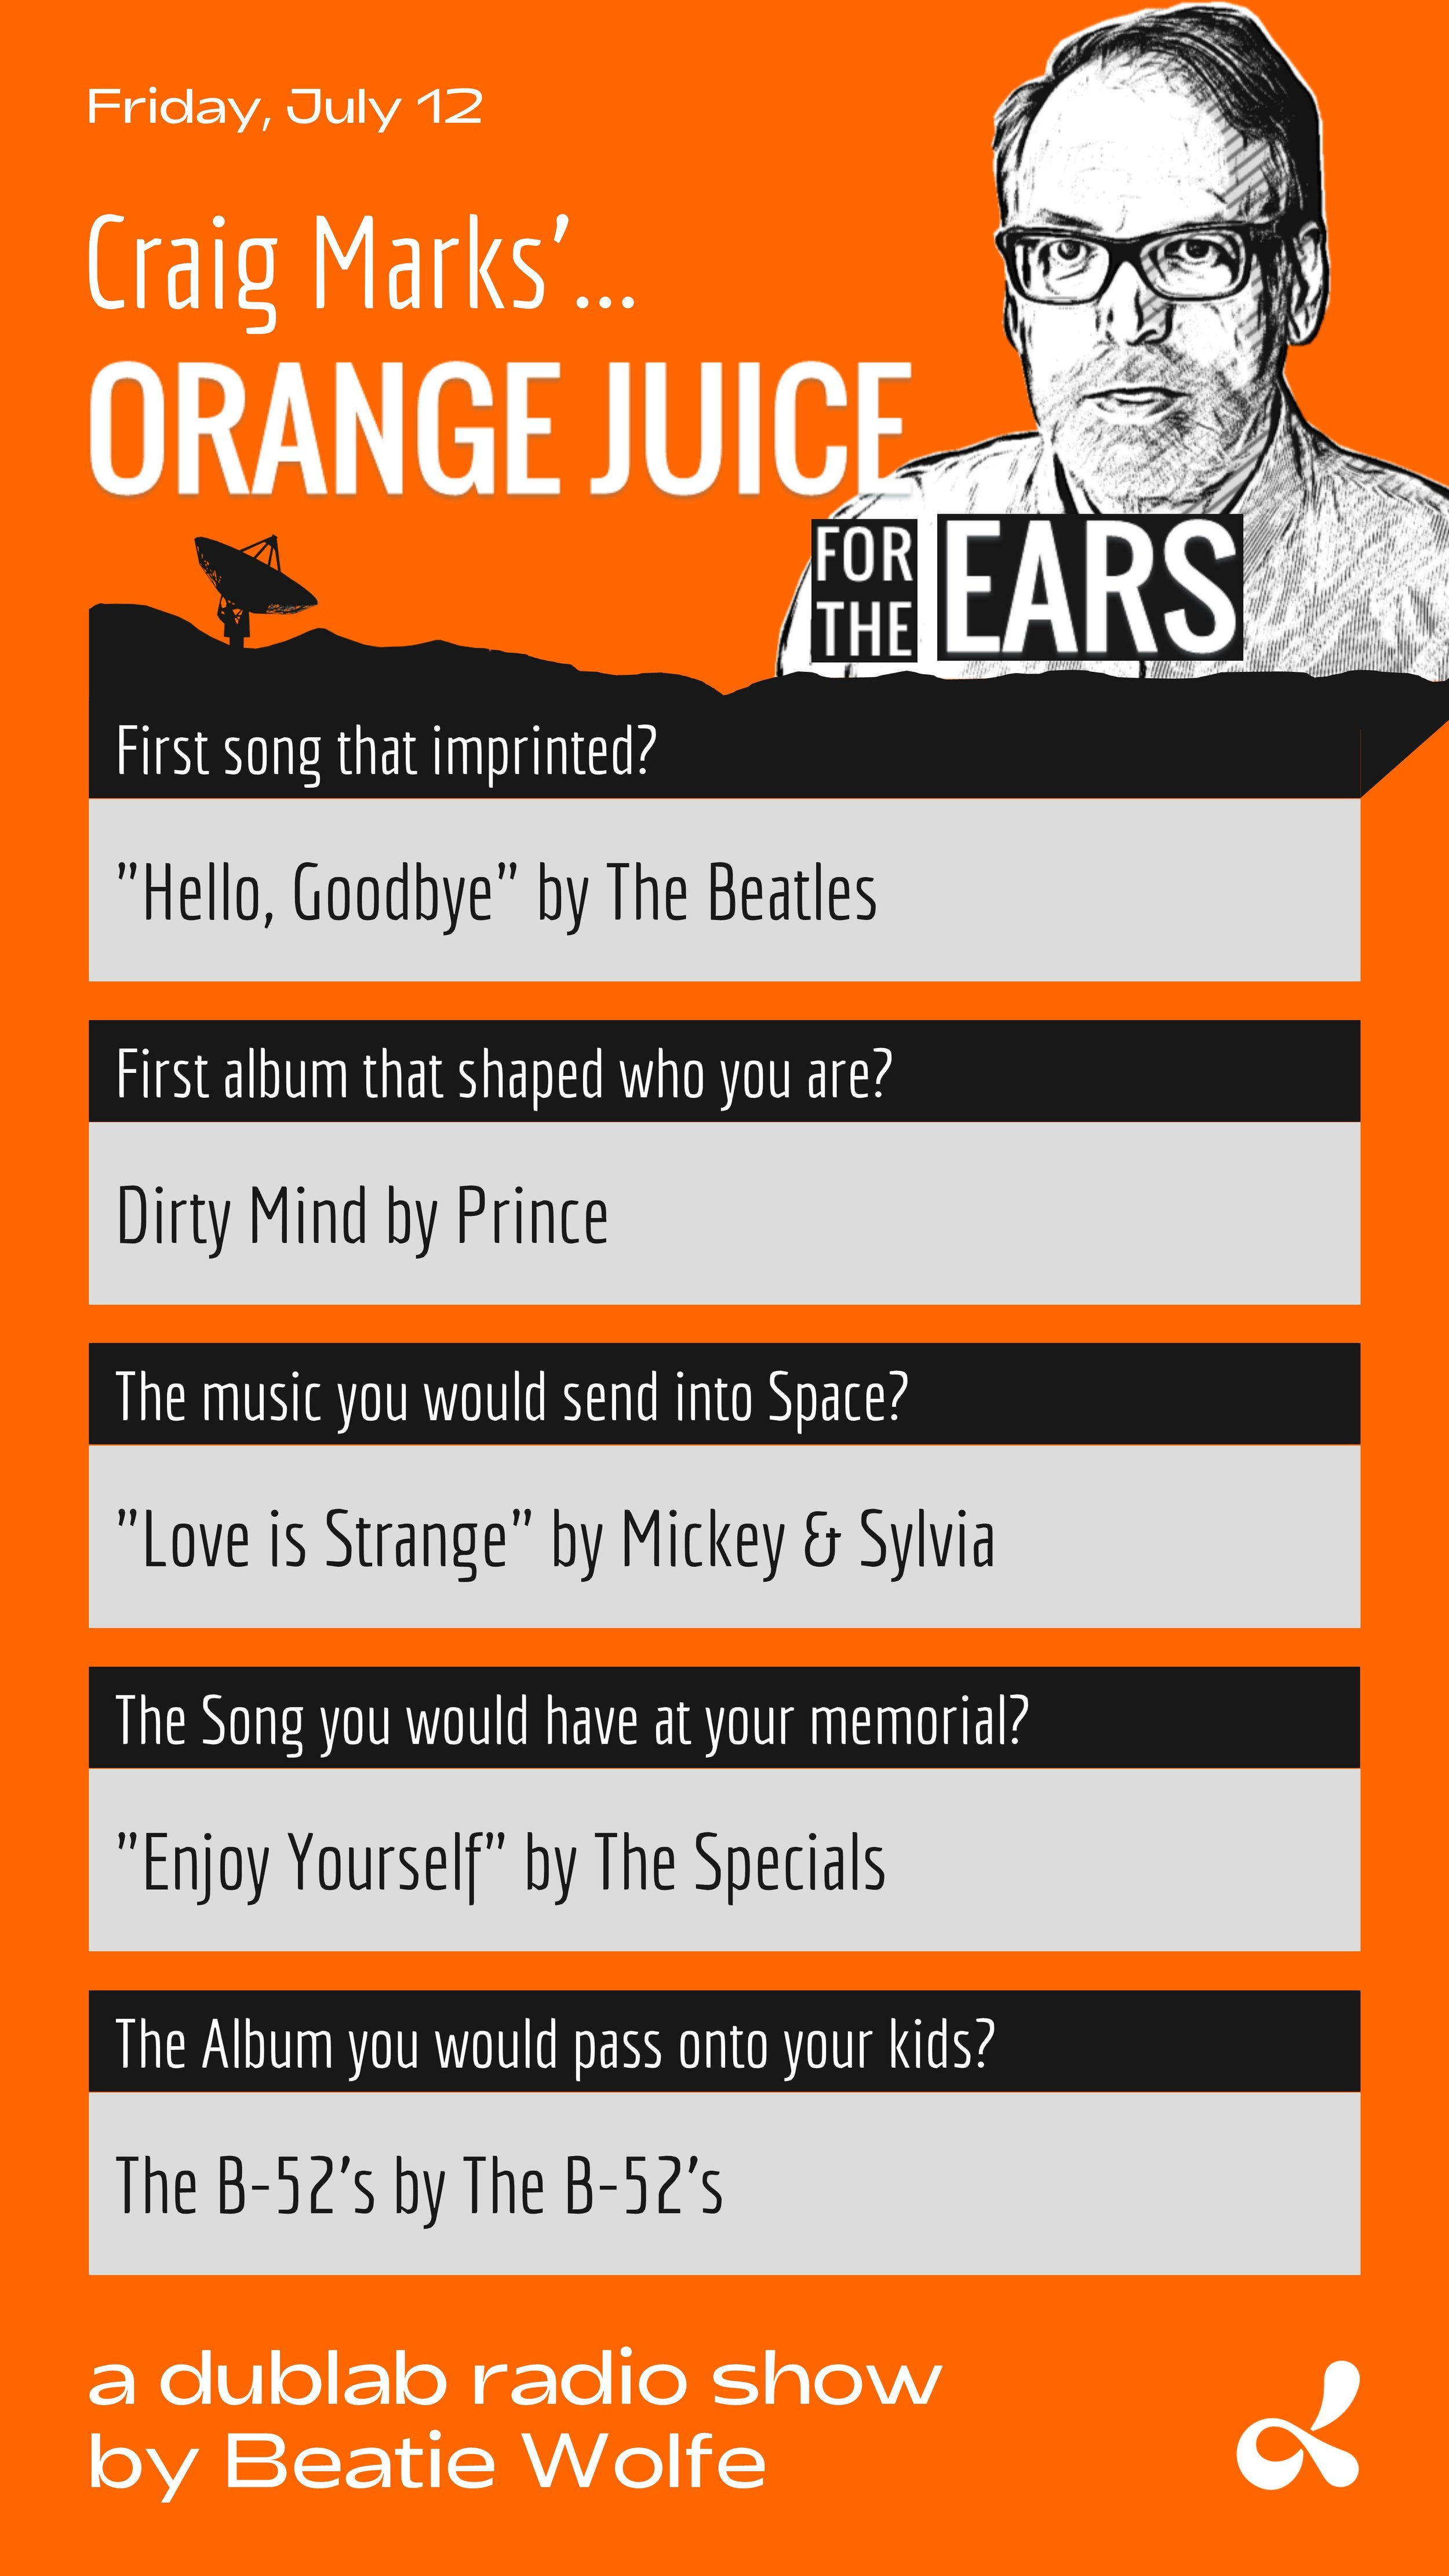 Ear OJ Tracks - Craig Marks - IG Stories.jpg